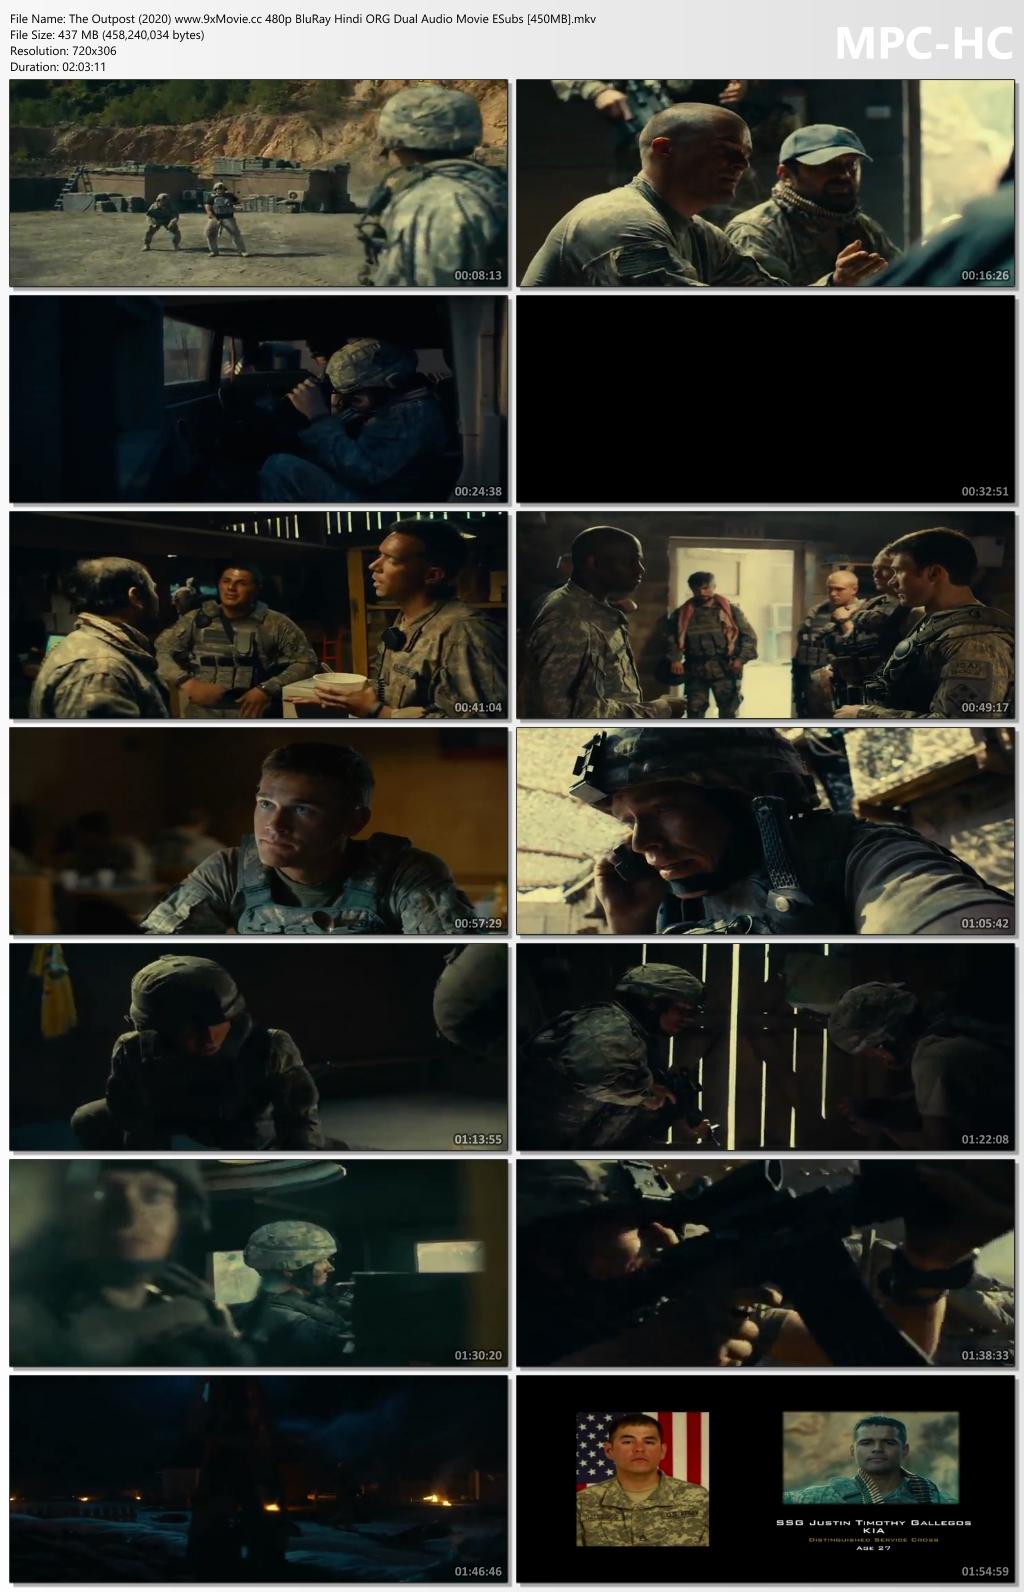 The-Outpost-2020-www-9x-Movie-cc-480p-Blu-Ray-Hindi-ORG-Dual-Audio-Movie-ESubs-450-MB-mkv